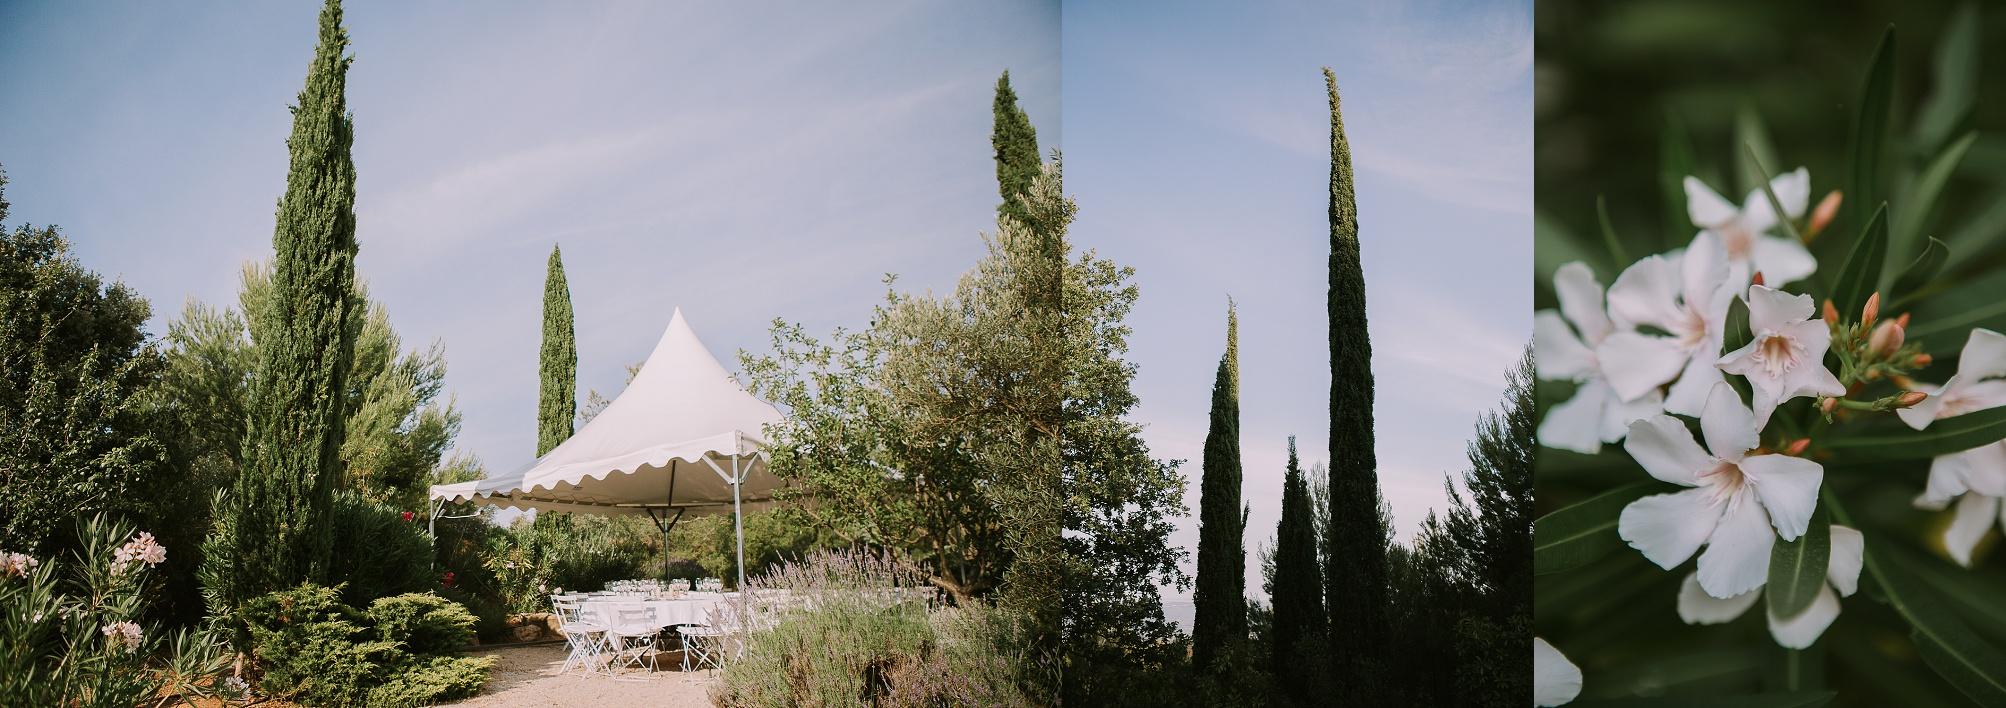 katerynaphotos-mariage-photographe-puyloubier-provence-aix-en-provence-sud-de-la-france_0421.jpg